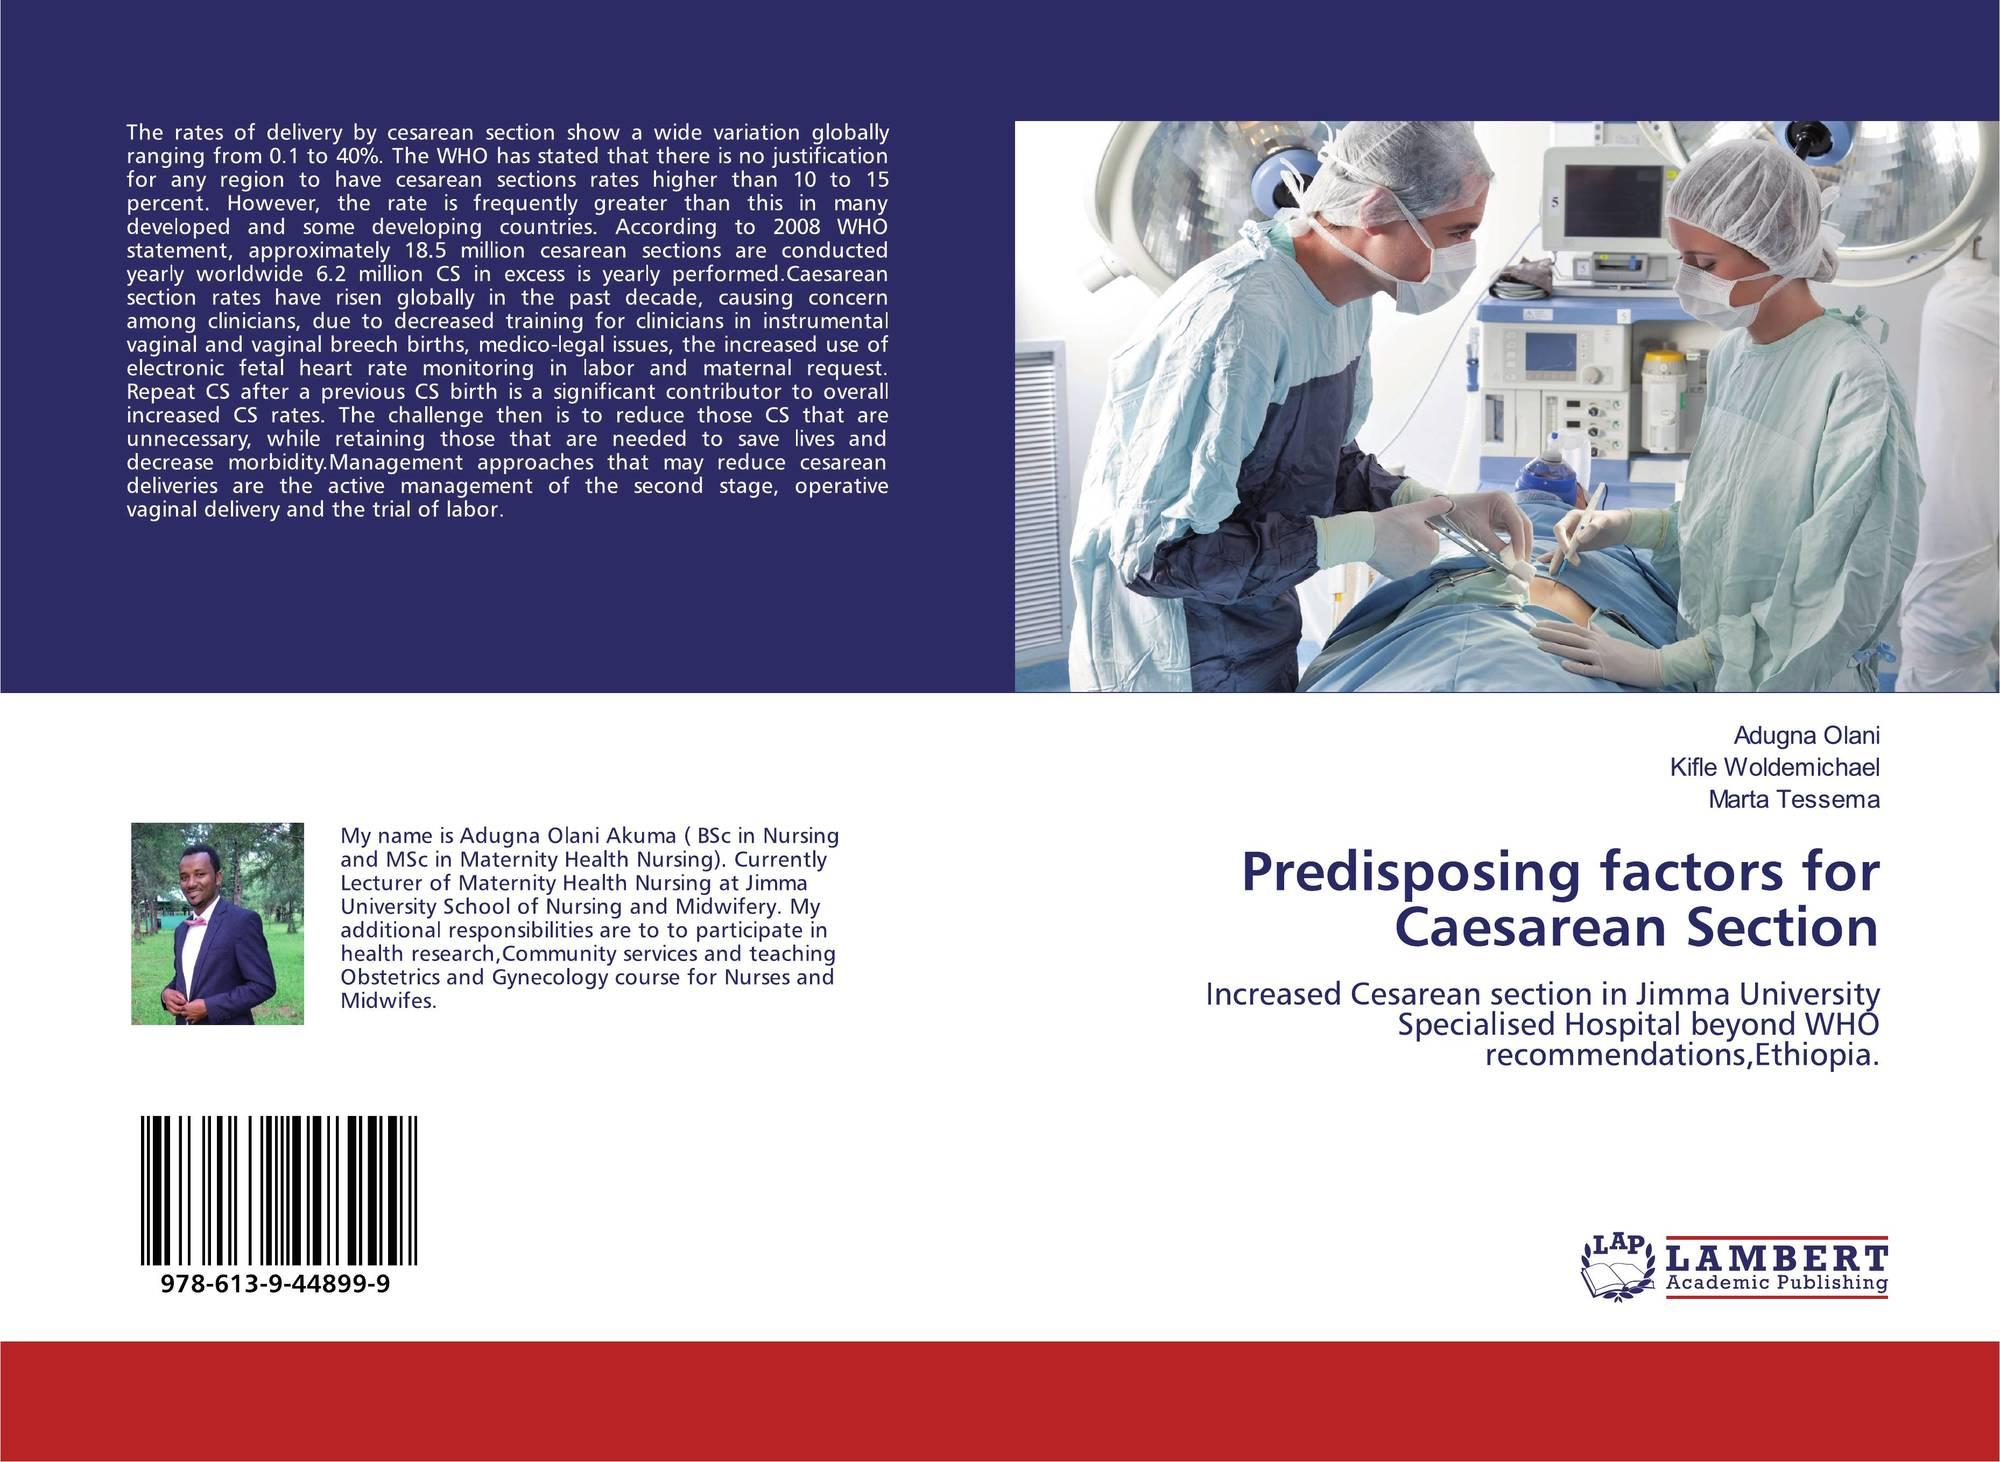 Predisposing factors for Caesarean Section, 978-613-9-44899